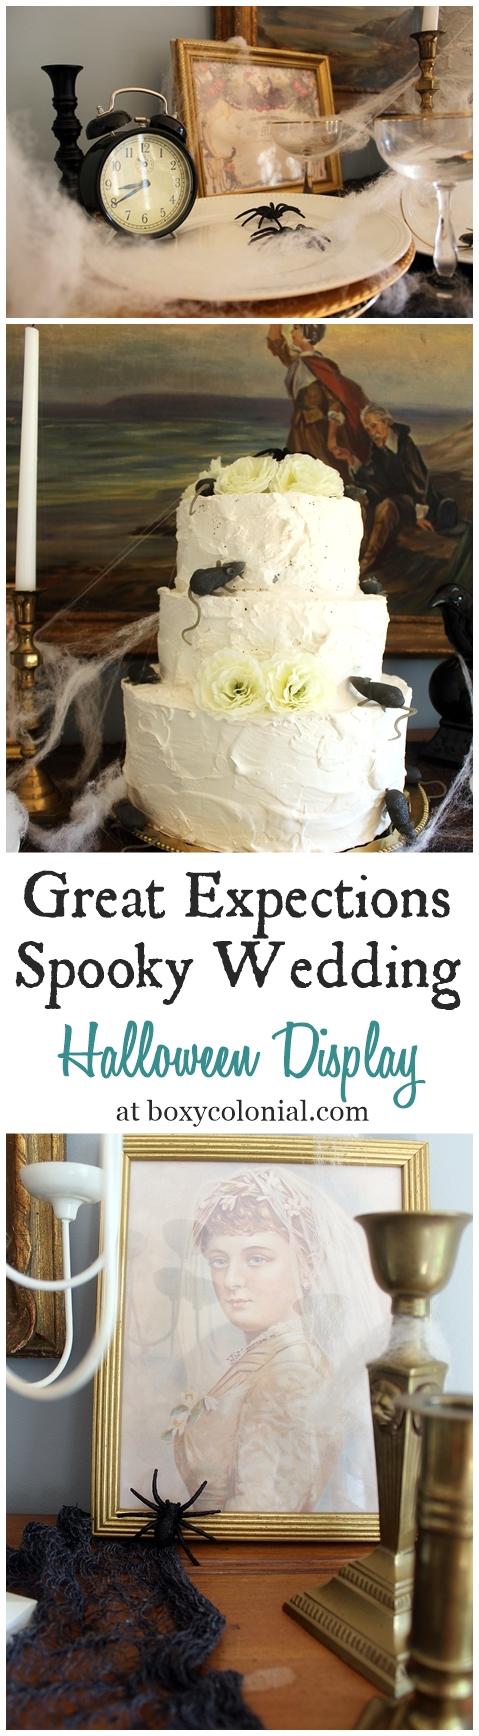 Recreate Miss Havisham's Spooky Wedding feast from Great Expectations for Halloween